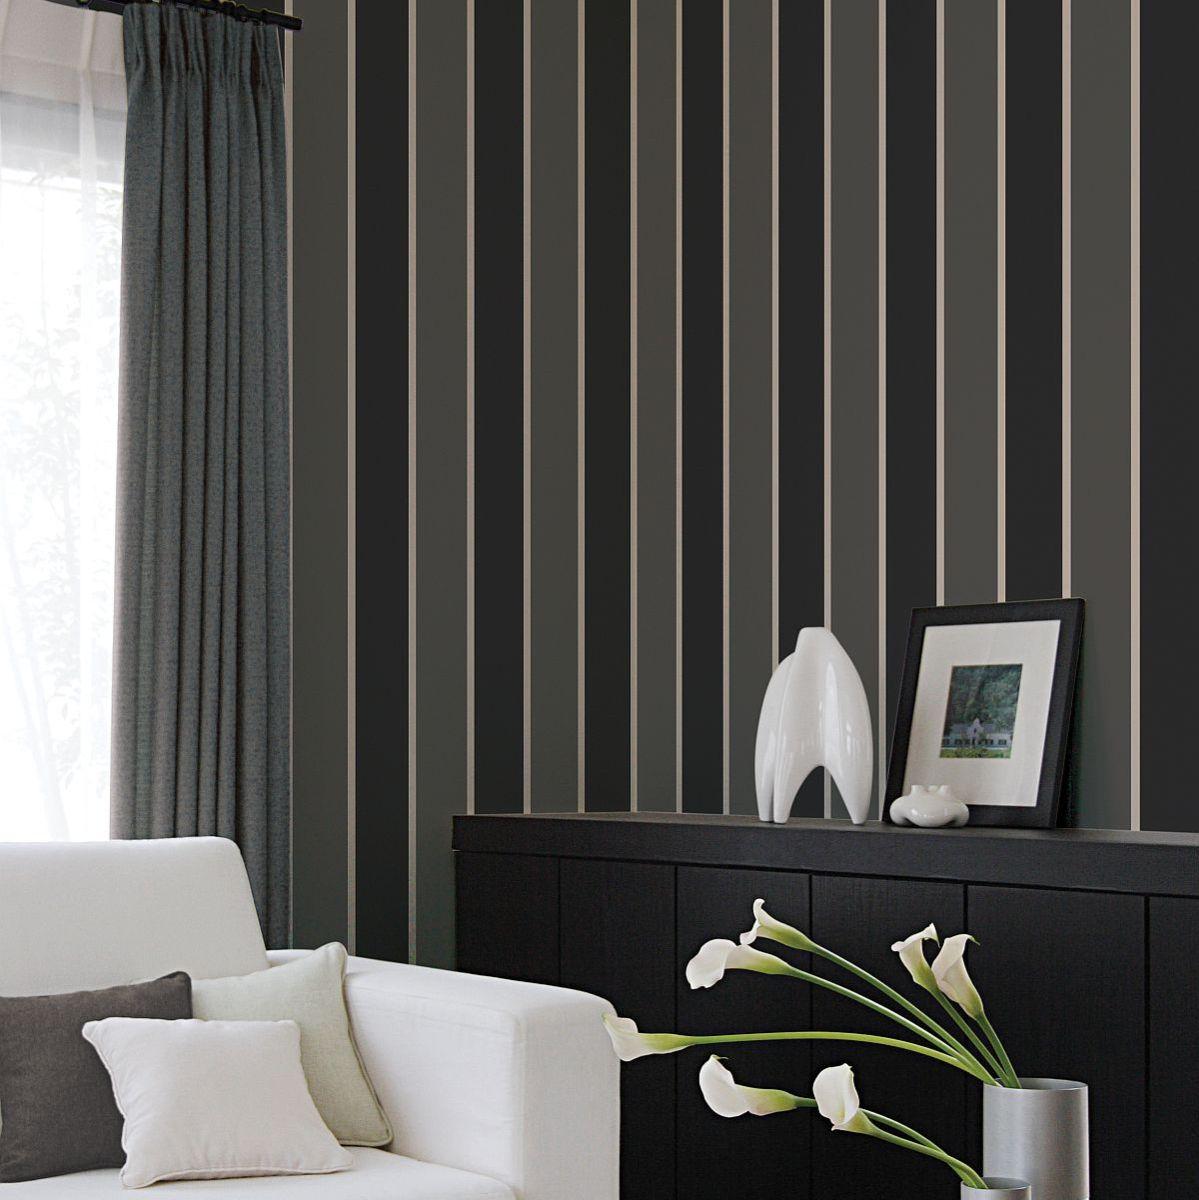 Vinyl Wallpaper On Non Woven Smart Stripes Wide Stripes